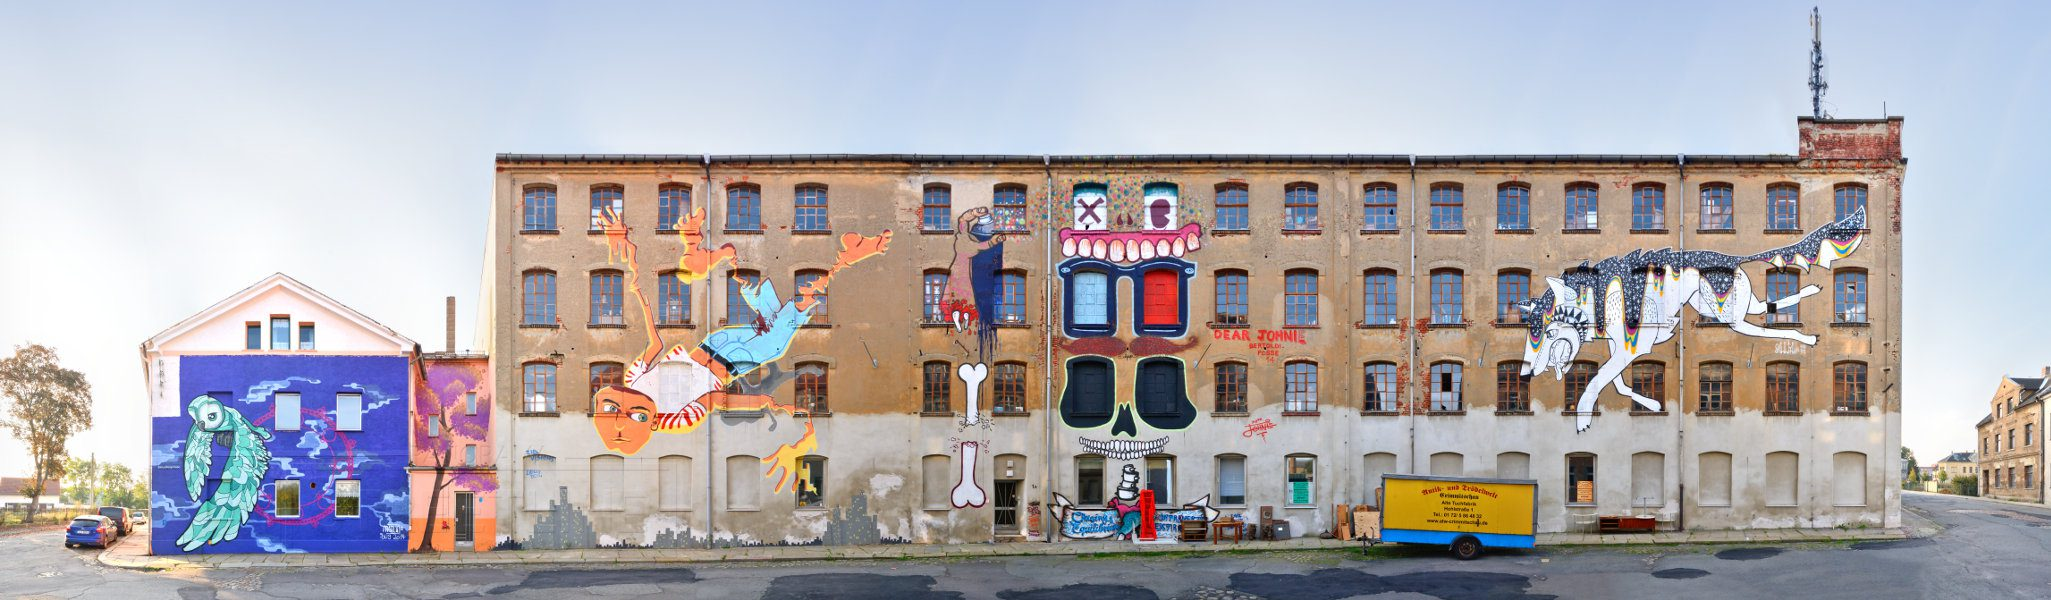 ibug 2014 | Gutenbergstrasse